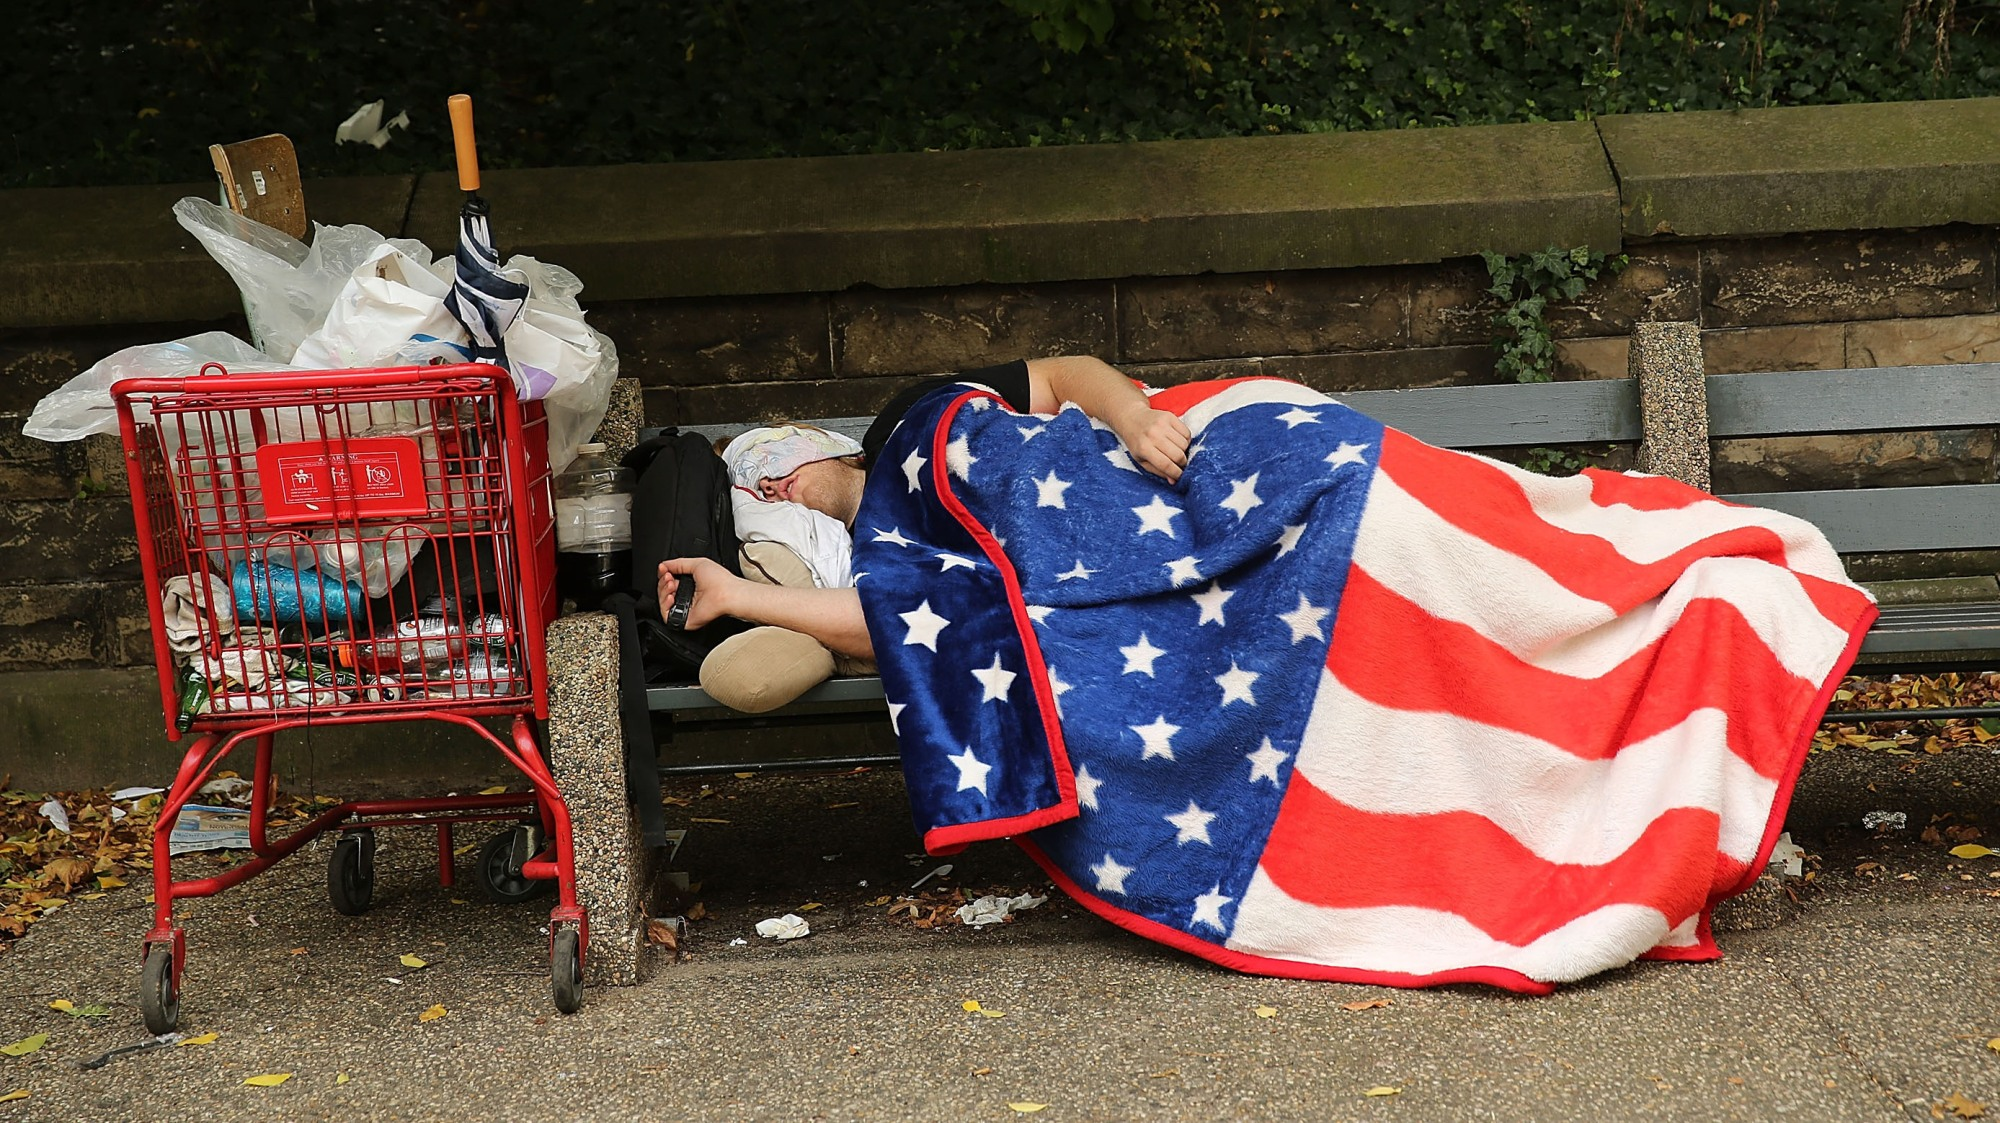 A homeless man sleeps under an American flag blanket